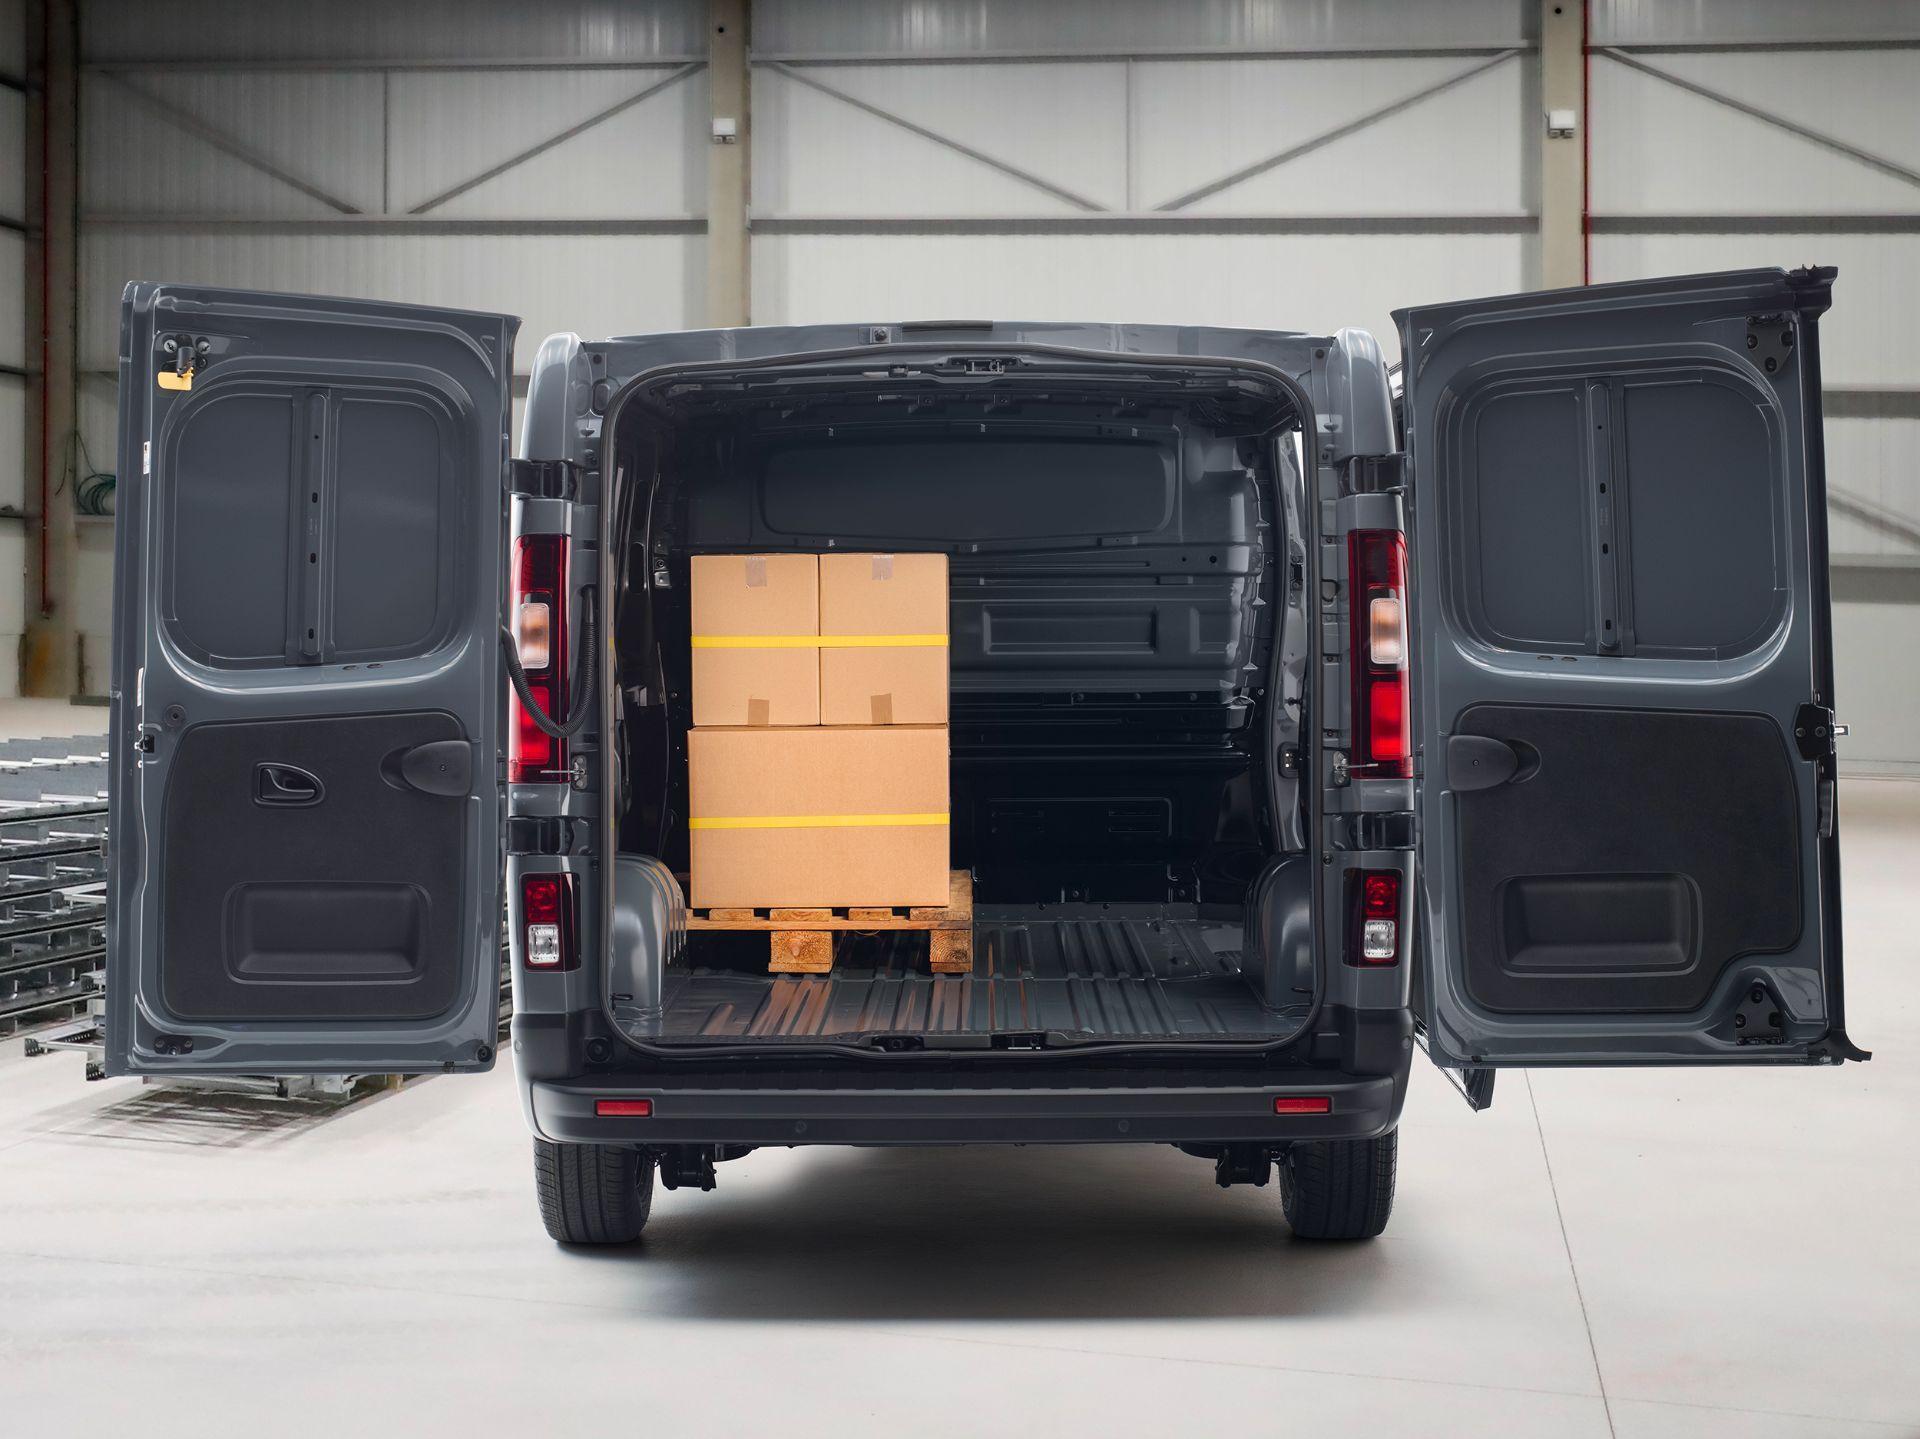 2022-Nissan-Primastar-Van-9-1